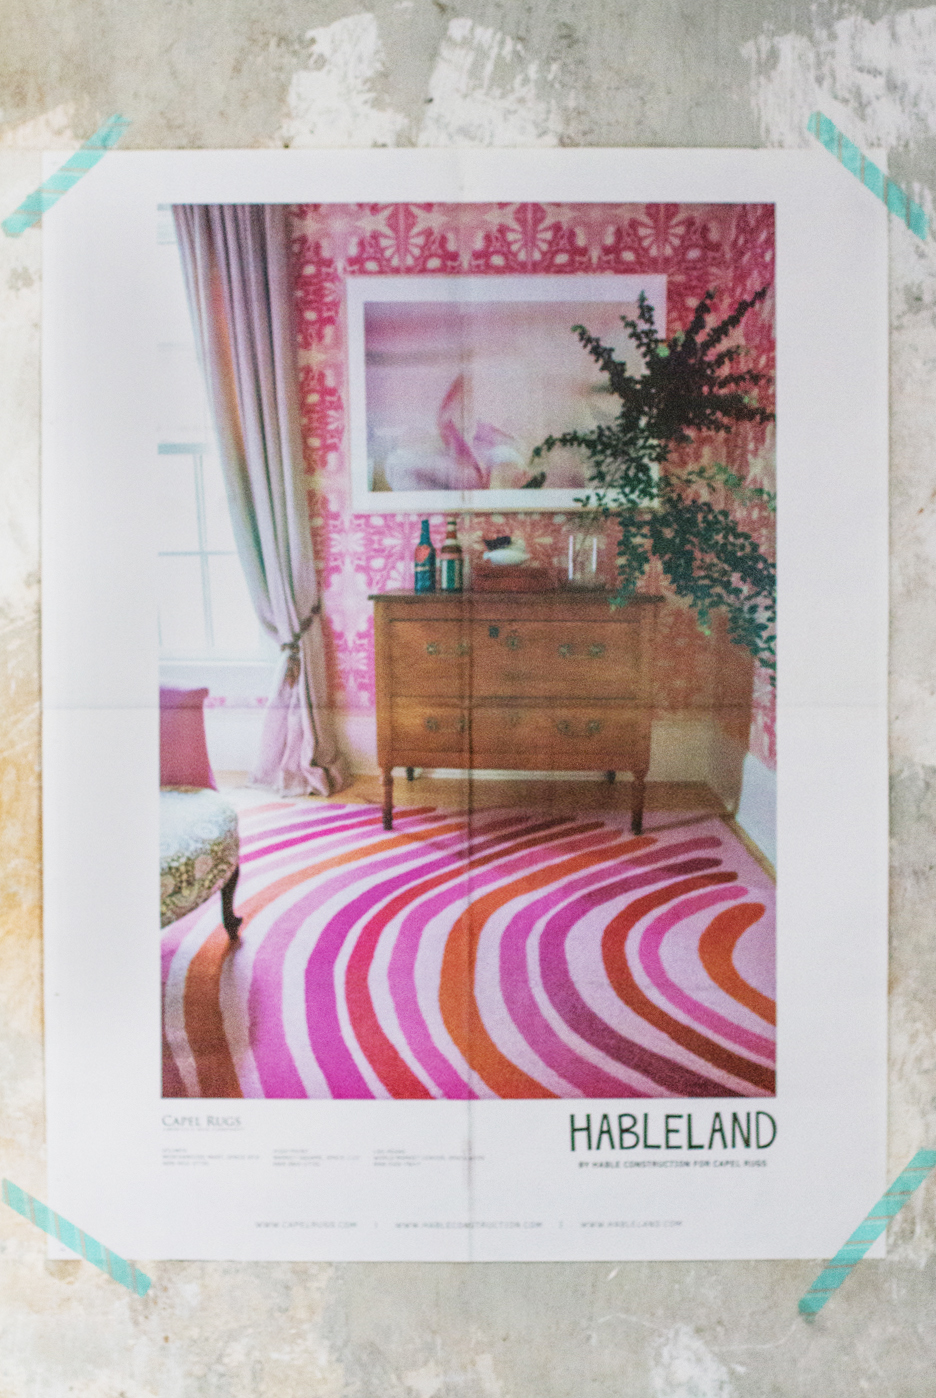 hableland_poster-9940.jpg